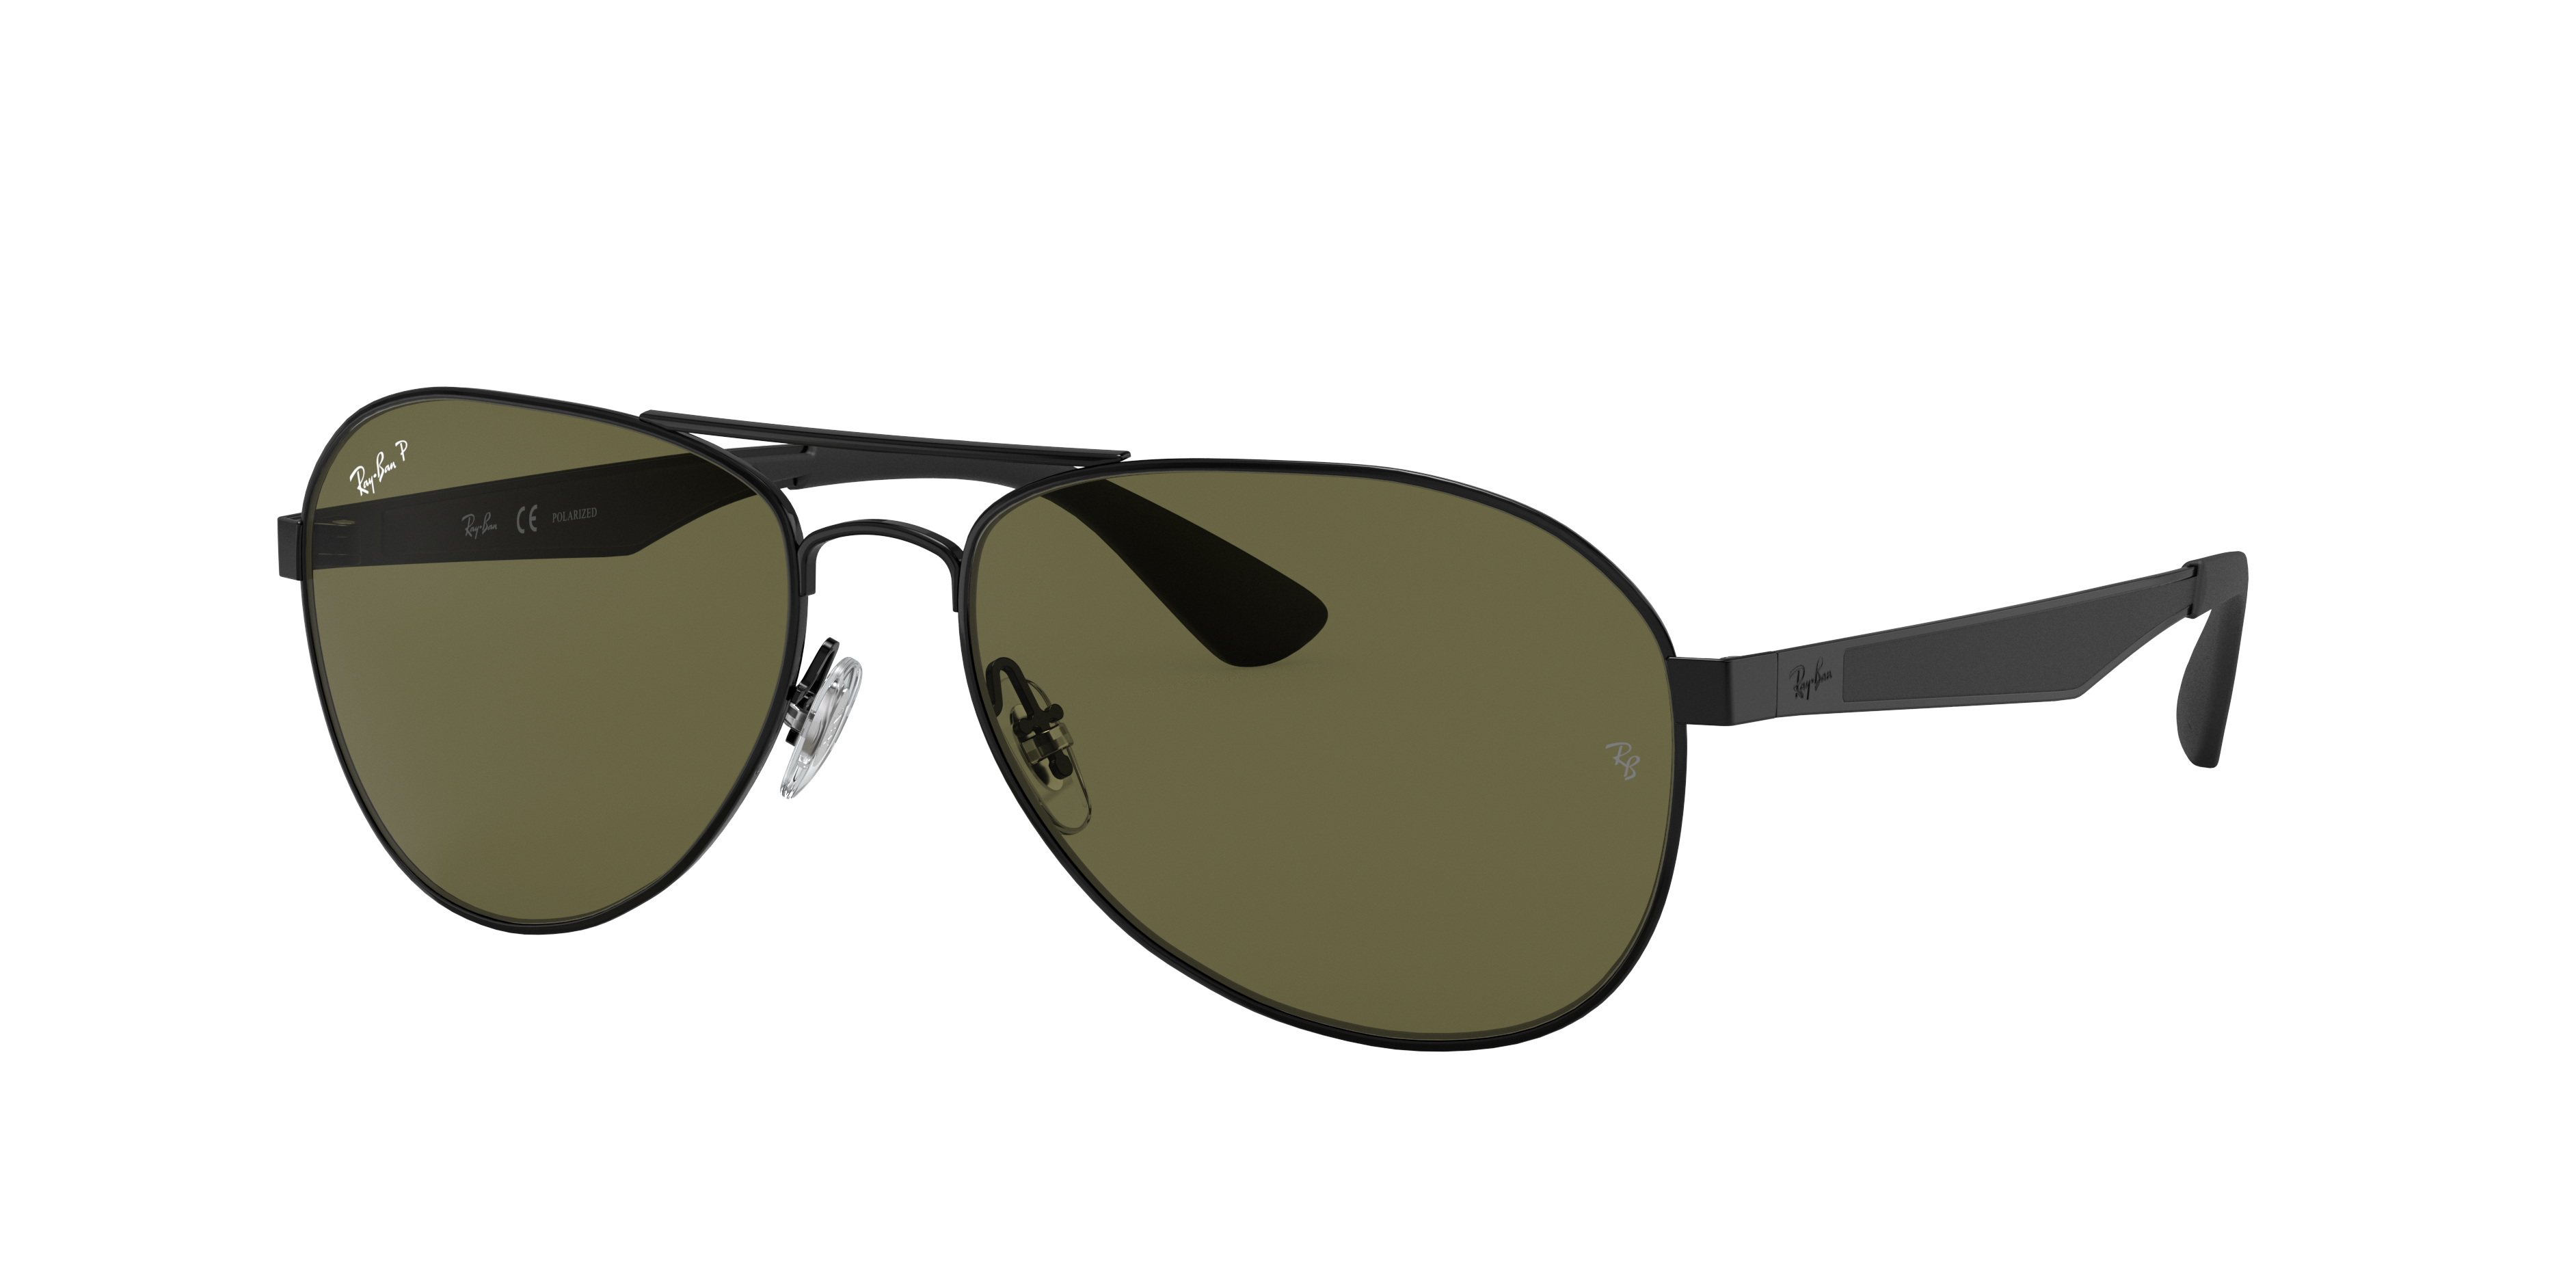 Ray-Ban Rb3549 Black, Polarized Green Lenses - RB3549